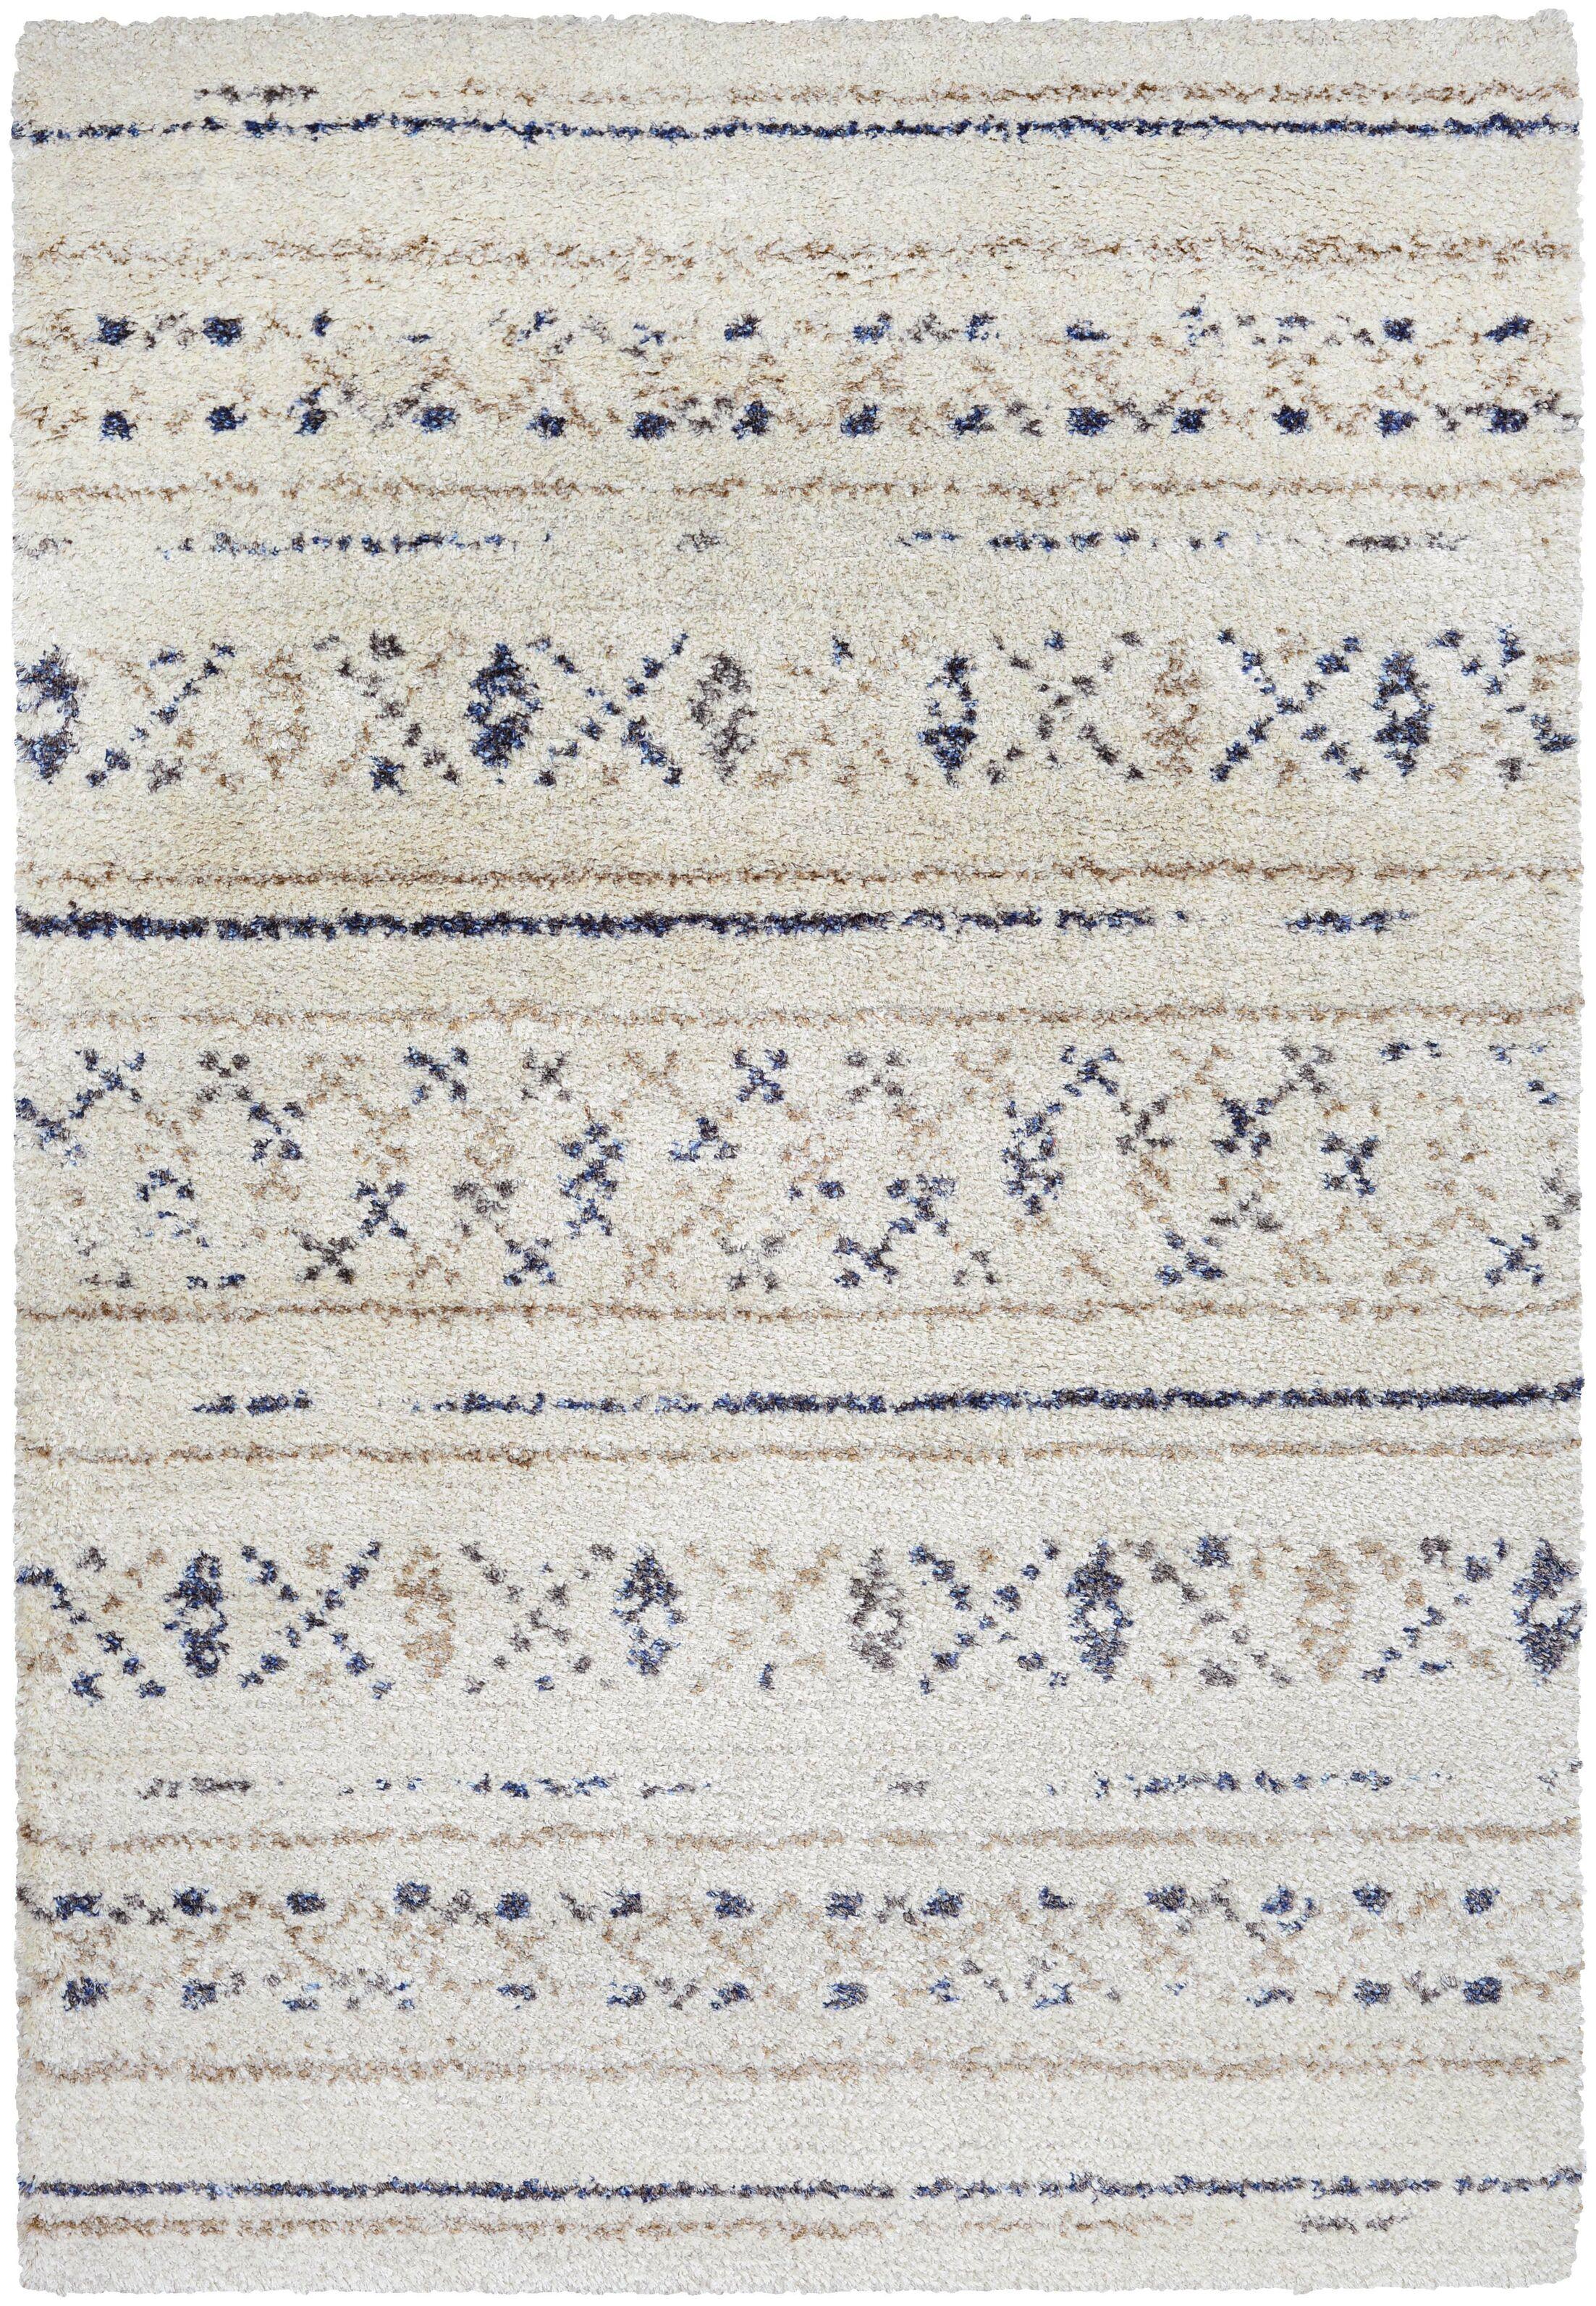 Kimberly Novia Ivory/Navy Blue Area Rug Rug Size: Rectangle 3'11